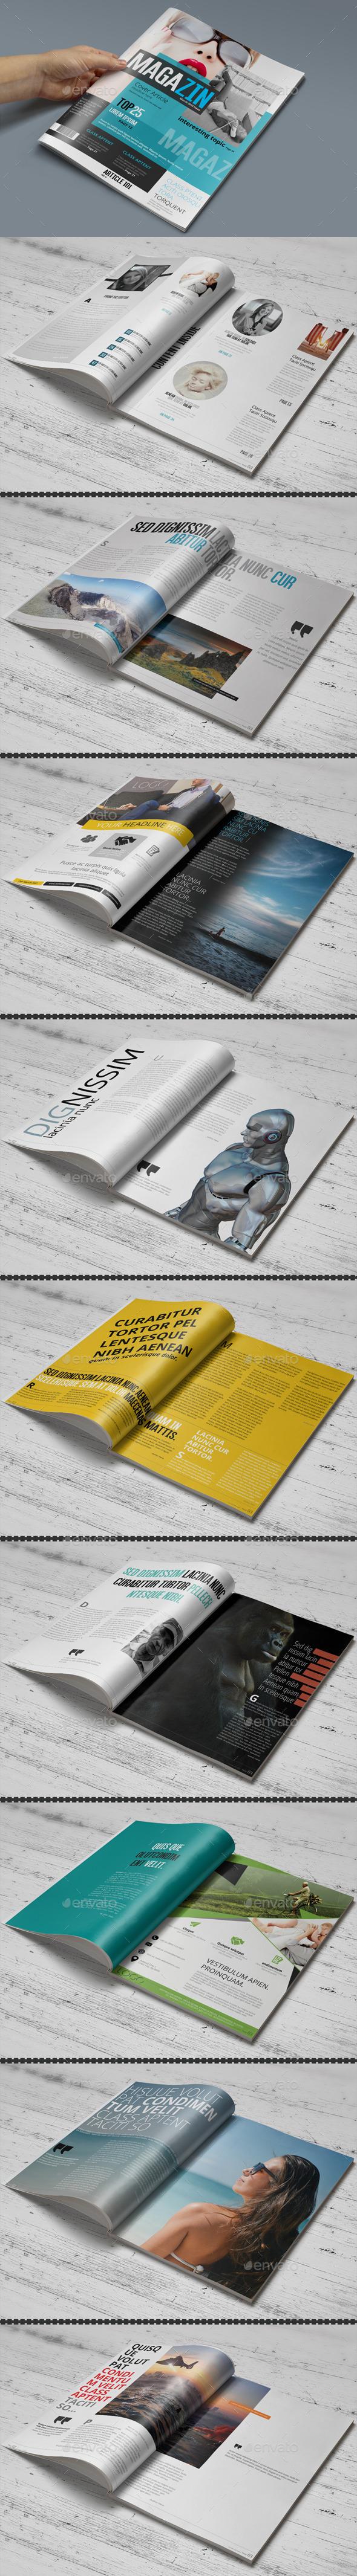 Magazine Template - Photoshop PSD - Magazines Print Templates